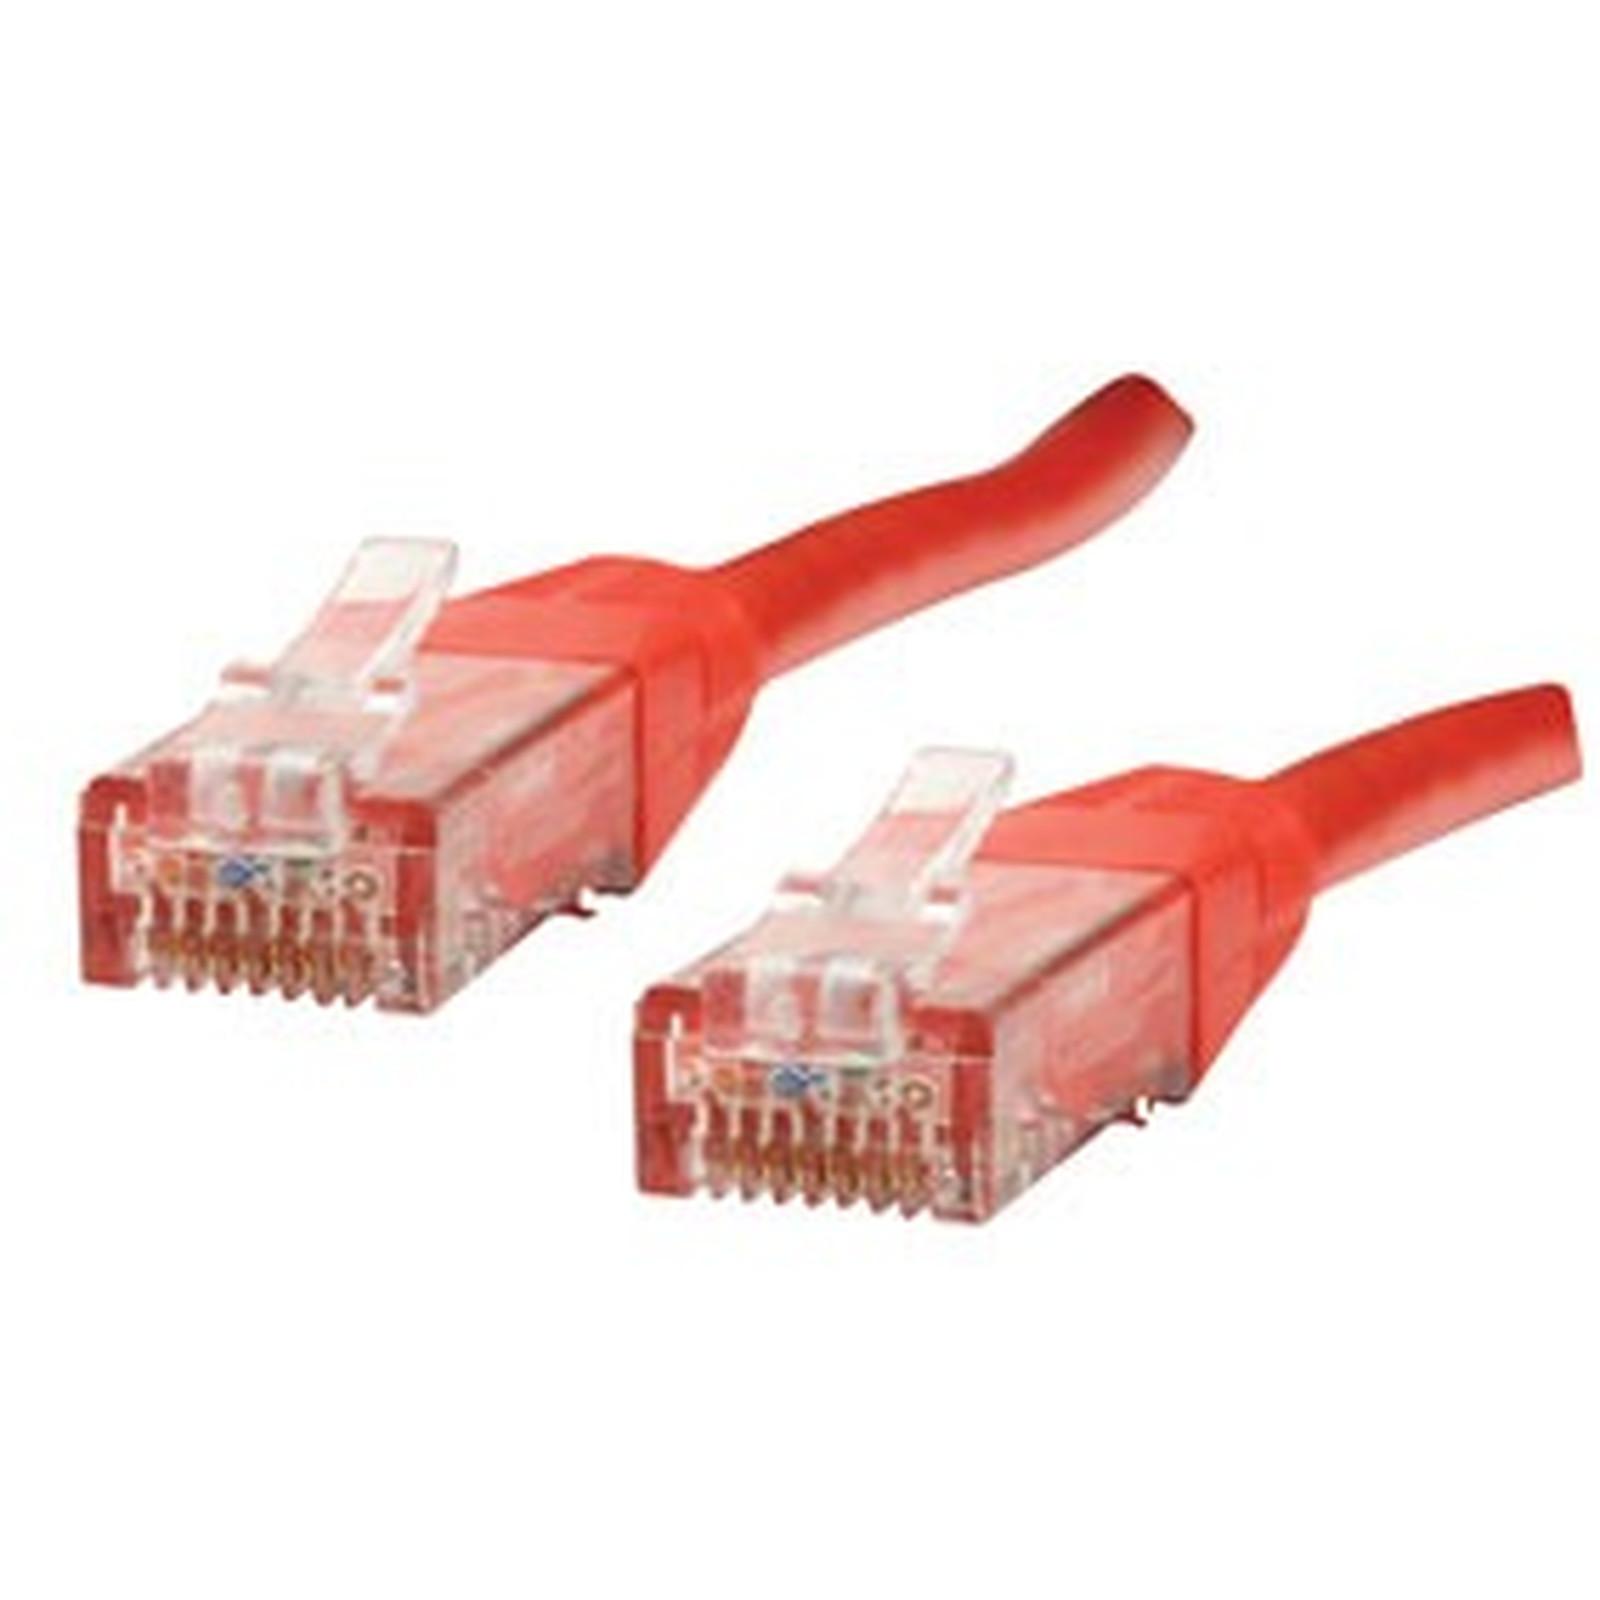 Câble RJ45 catégorie 6 U/UTP 2 m (Rouge)